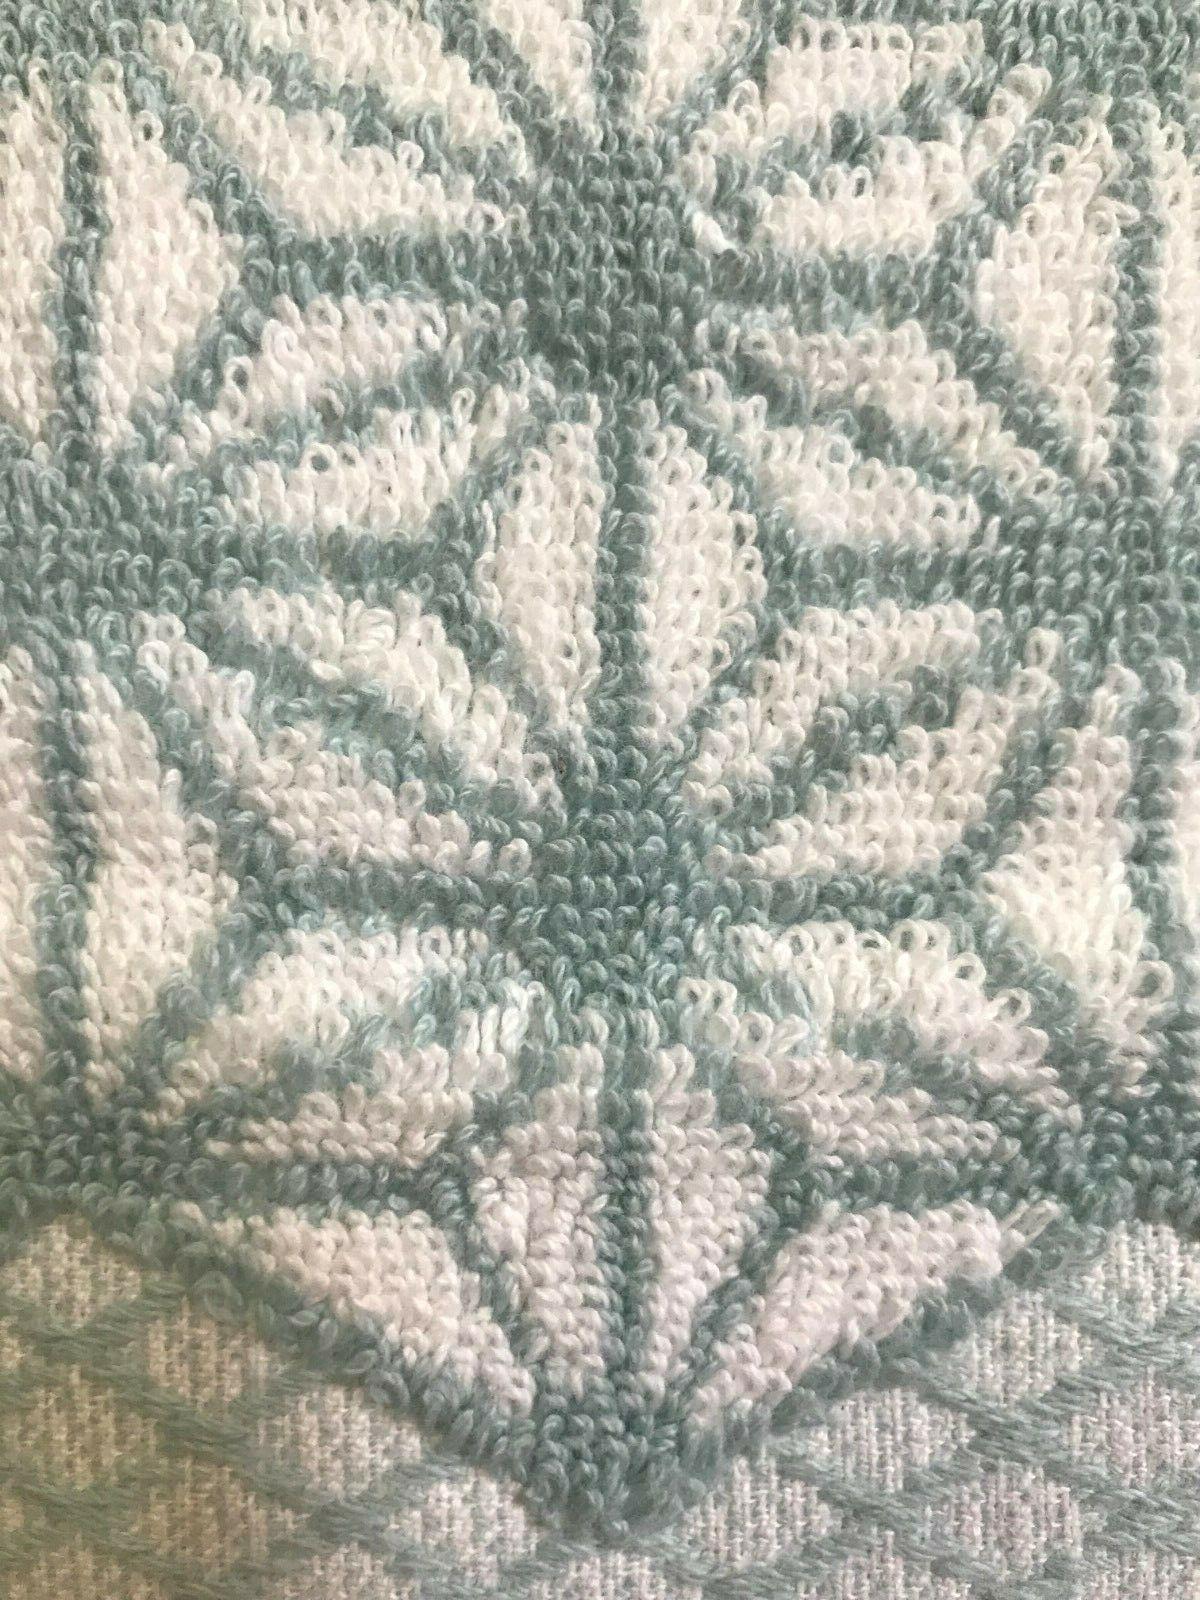 Set 2 Home Cotton Towels - Blue White Geometric Pattern